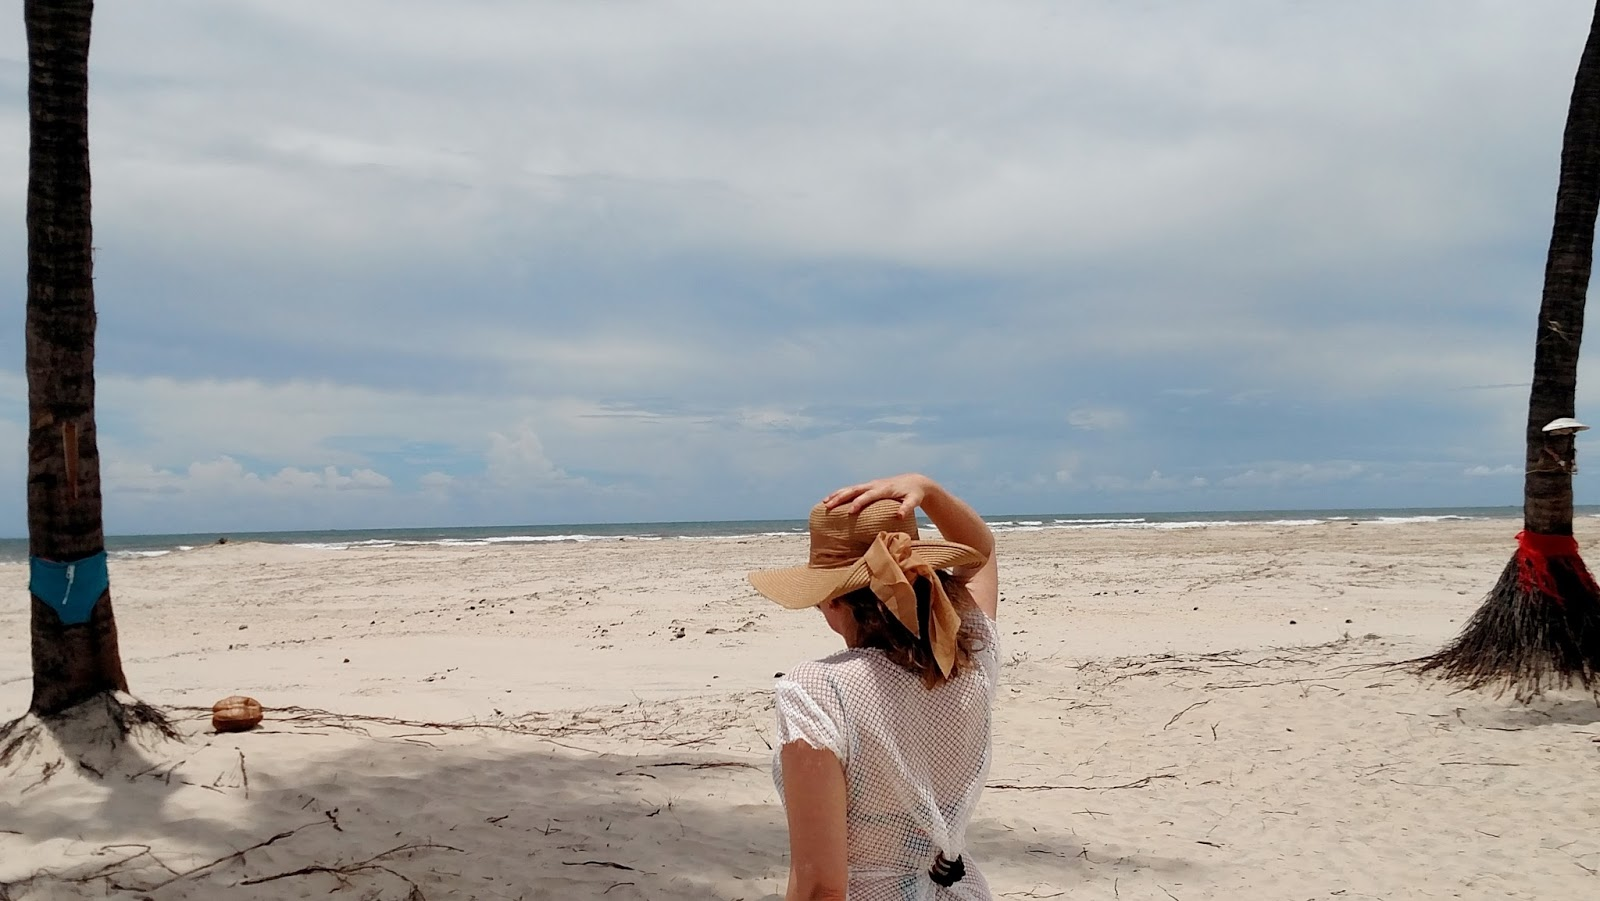 Coqueiros na Praia de Romeu e Julieta - Mangue Seco Bahia